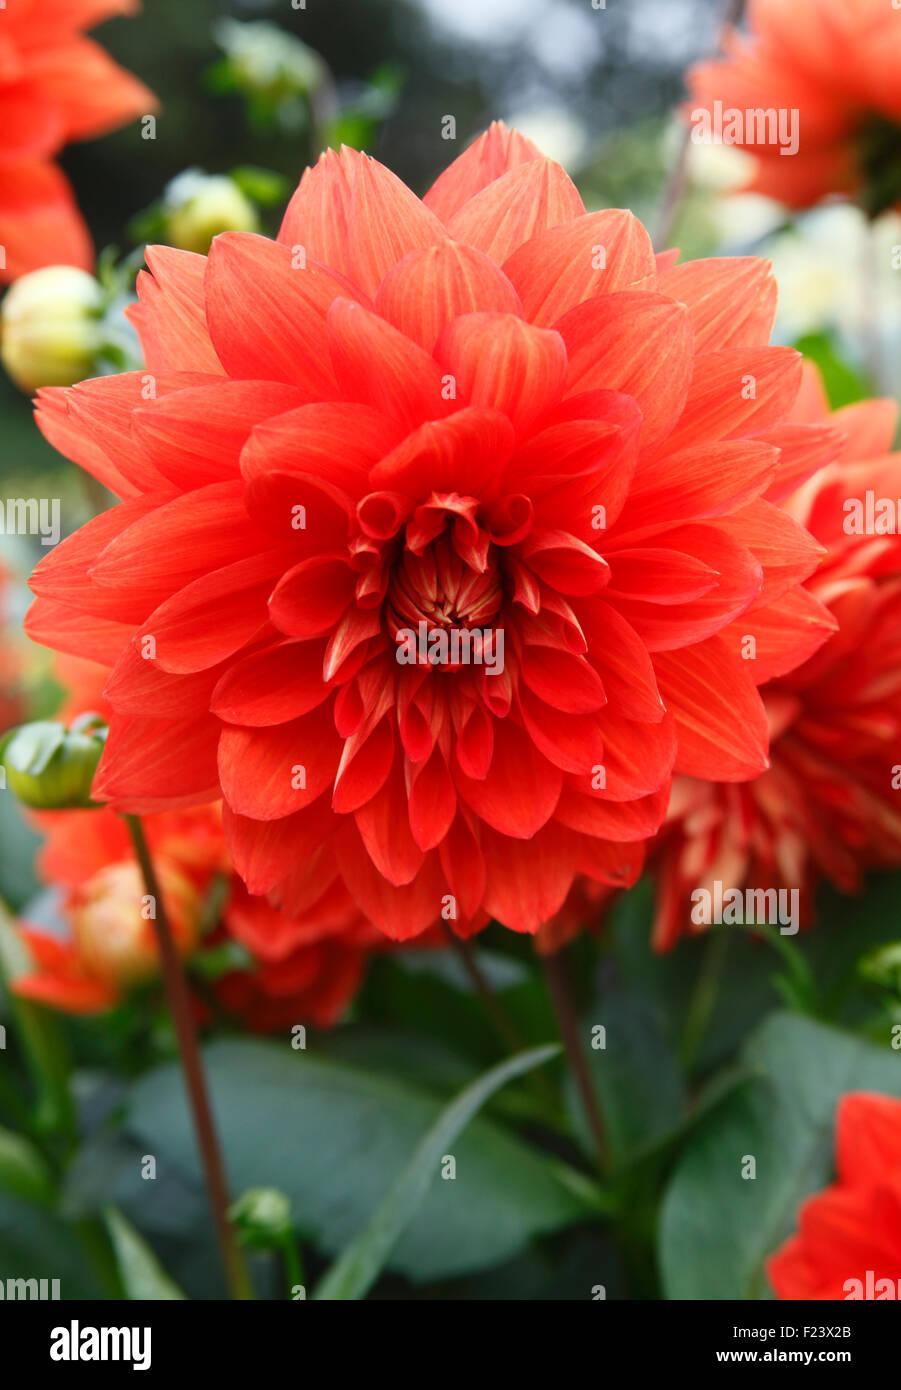 Dahlie 'Stadt Spremberg' Pflanze in Blüte Stockbild